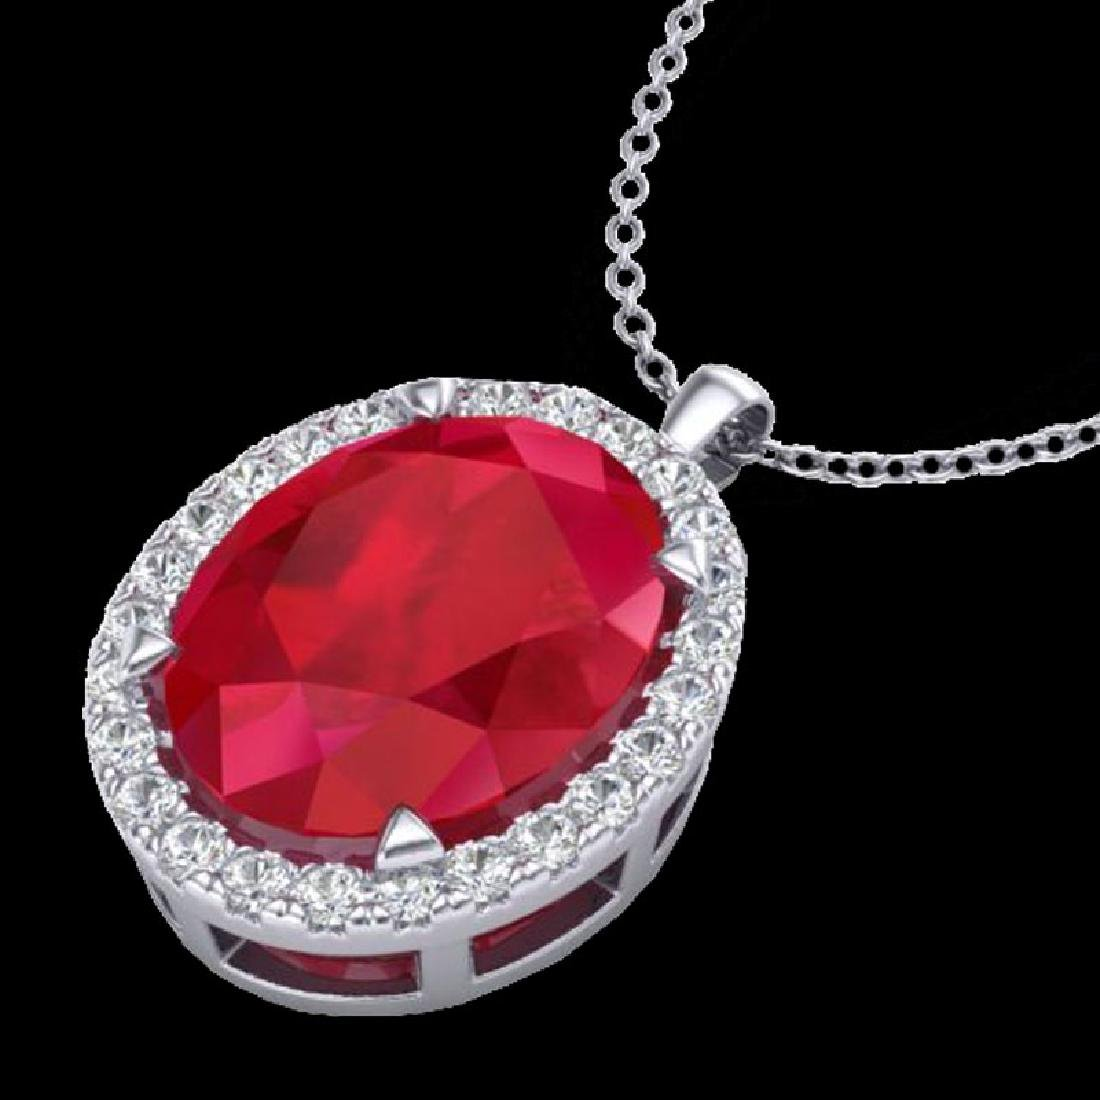 2.75 CTW Ruby & Micro VS/SI Diamond Halo Necklace 18K - 2